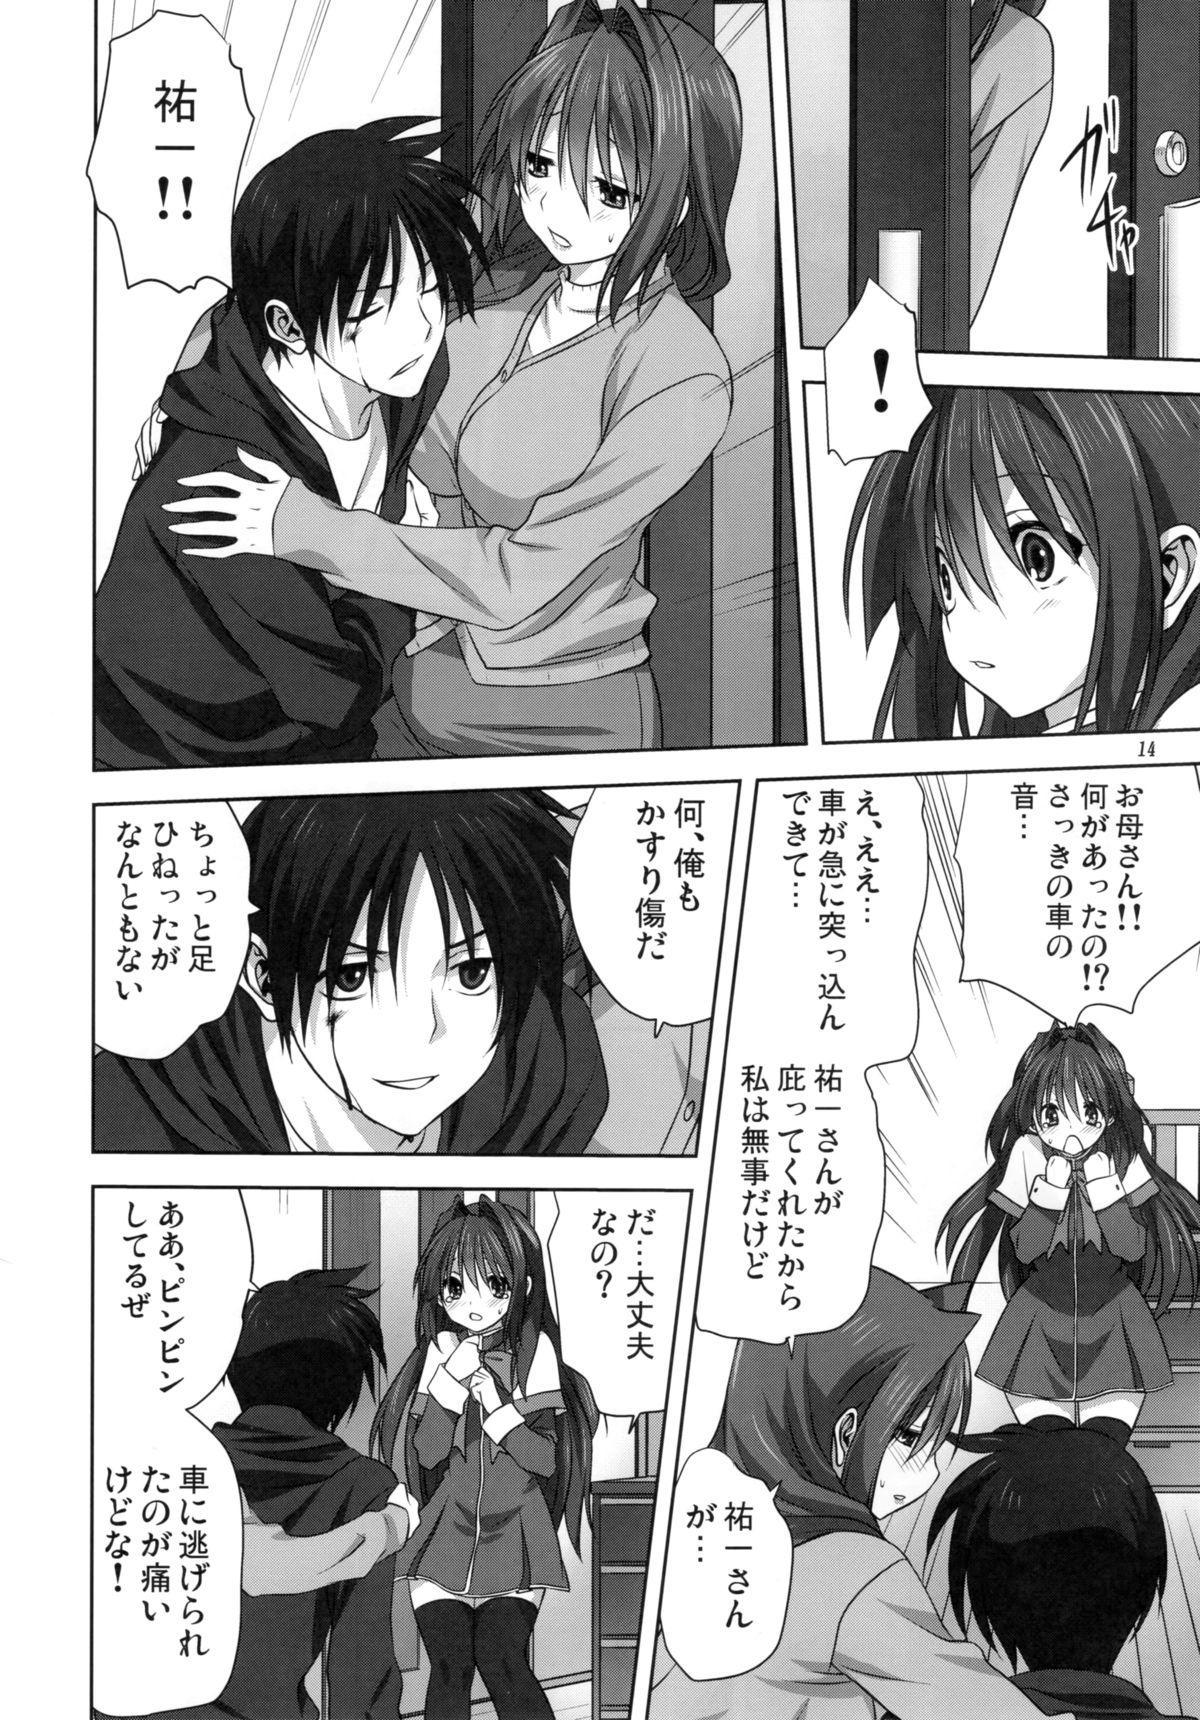 Akiko-san to Issho 16 12